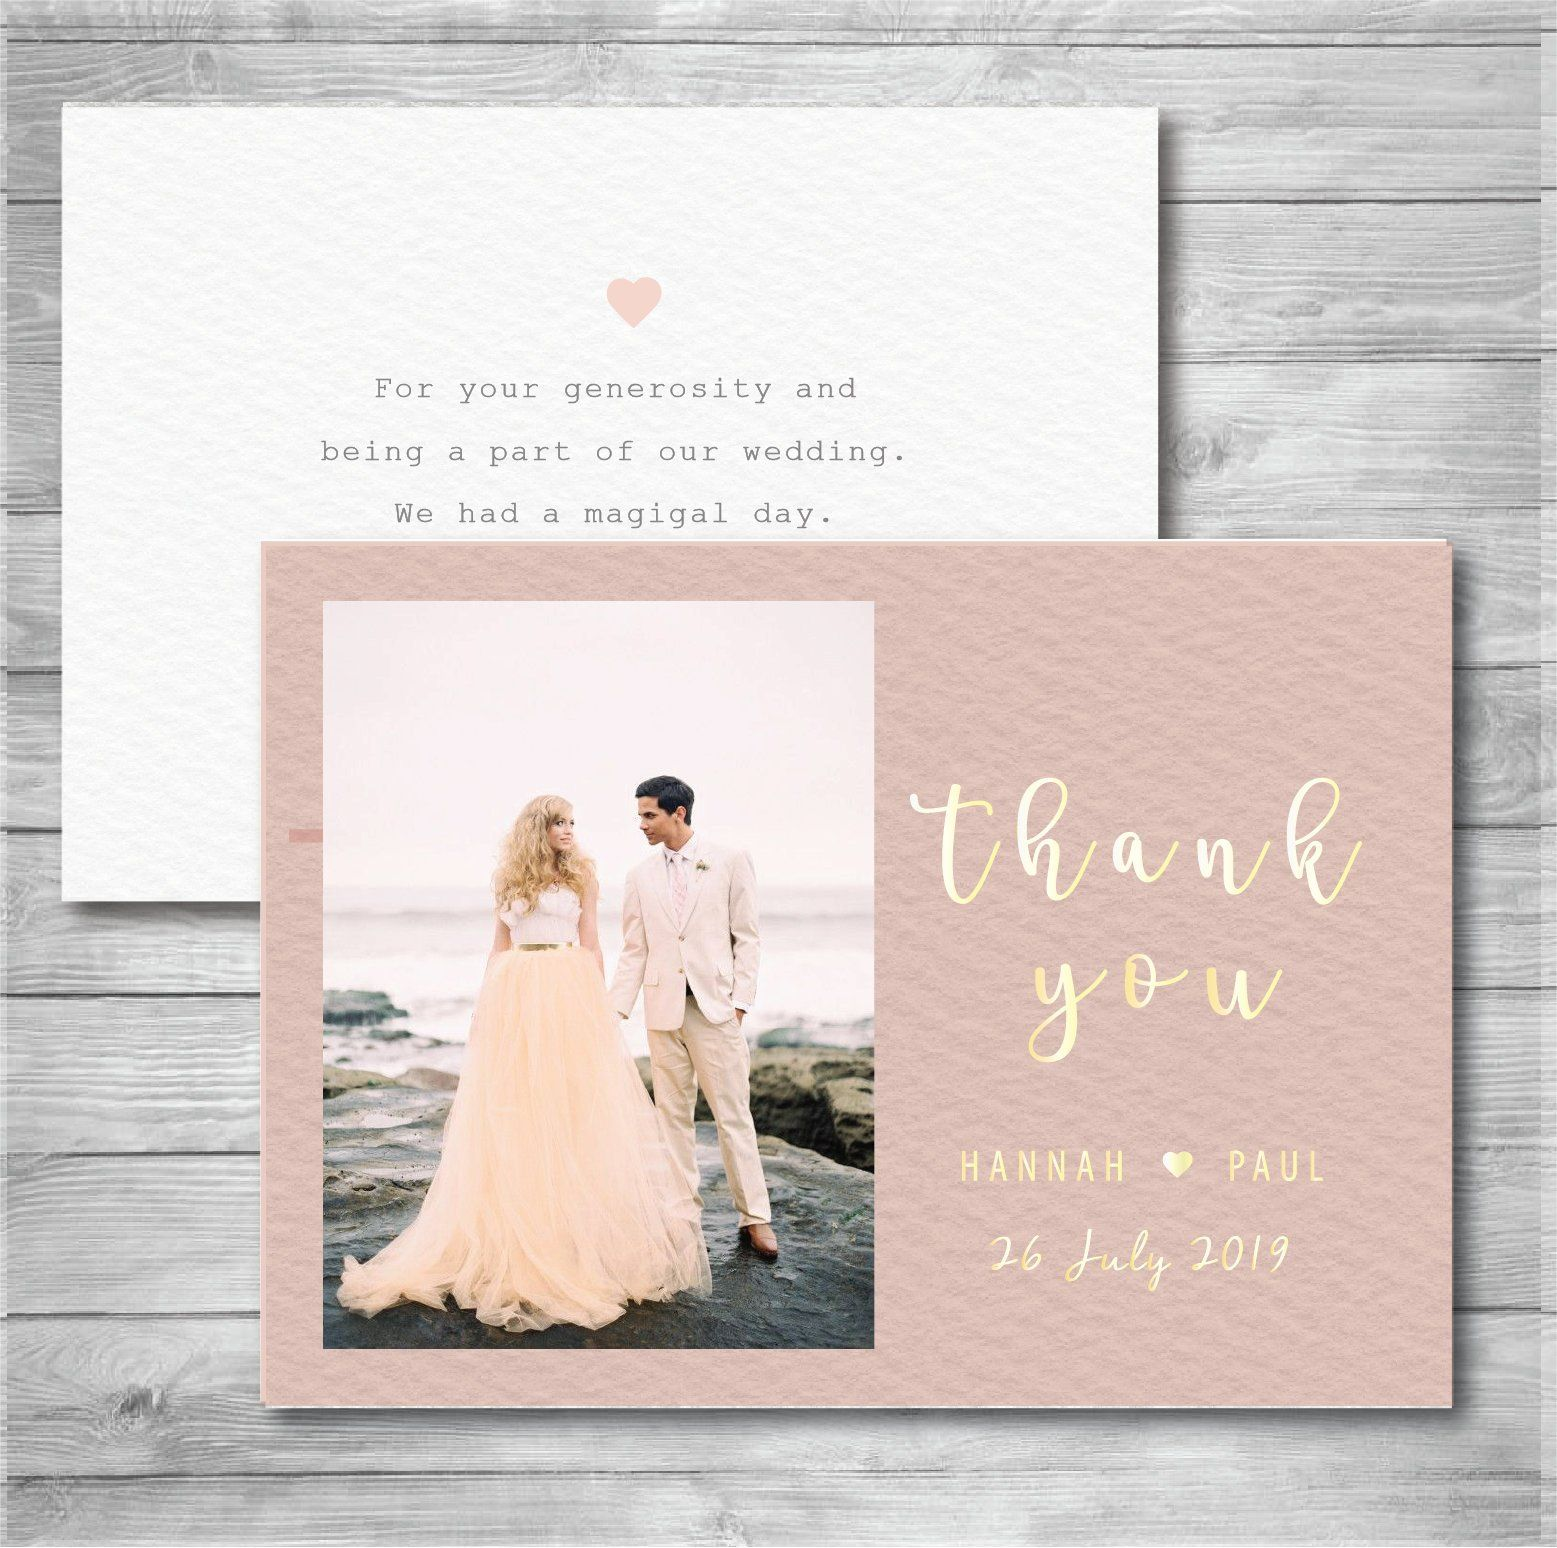 Wedding Thank You Cards With Photo Wedding Photo Thank You Etsy Wedding Thank You Cards Photo Thank You Cards Wedding Cards